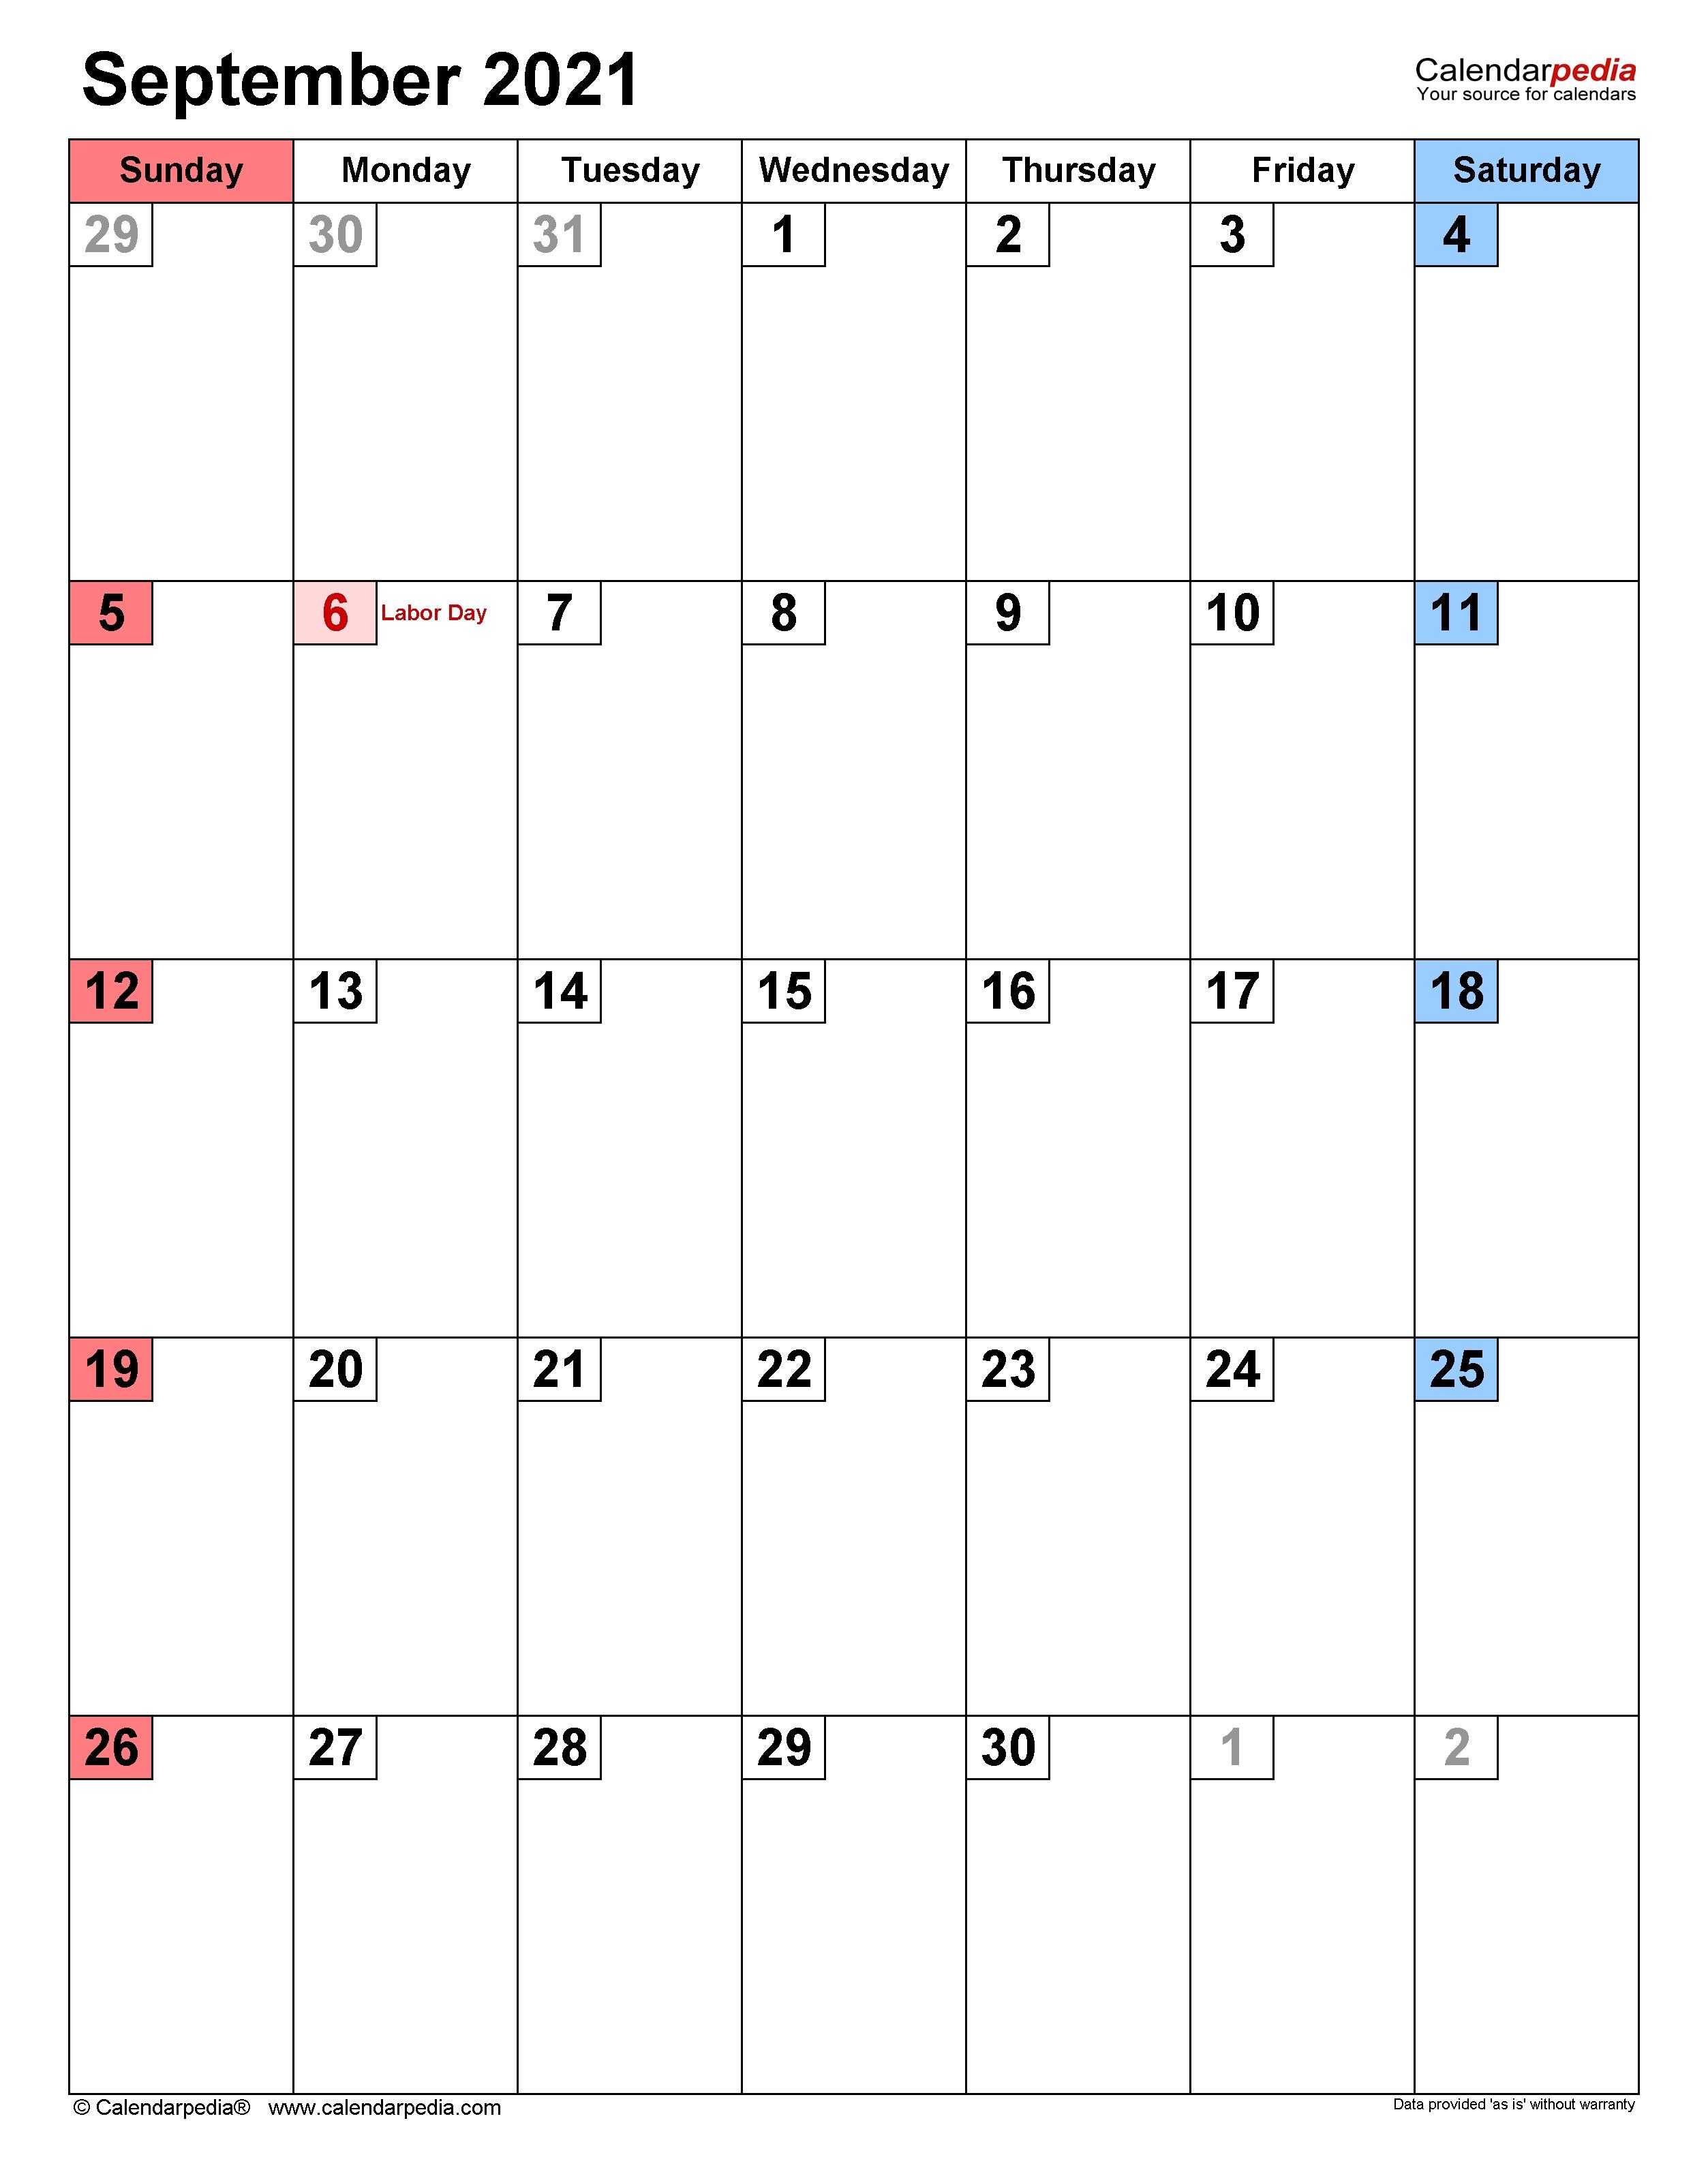 September 2021 Calendar   Templates For Word, Excel And Pdf September 2021 Calendar Pdf